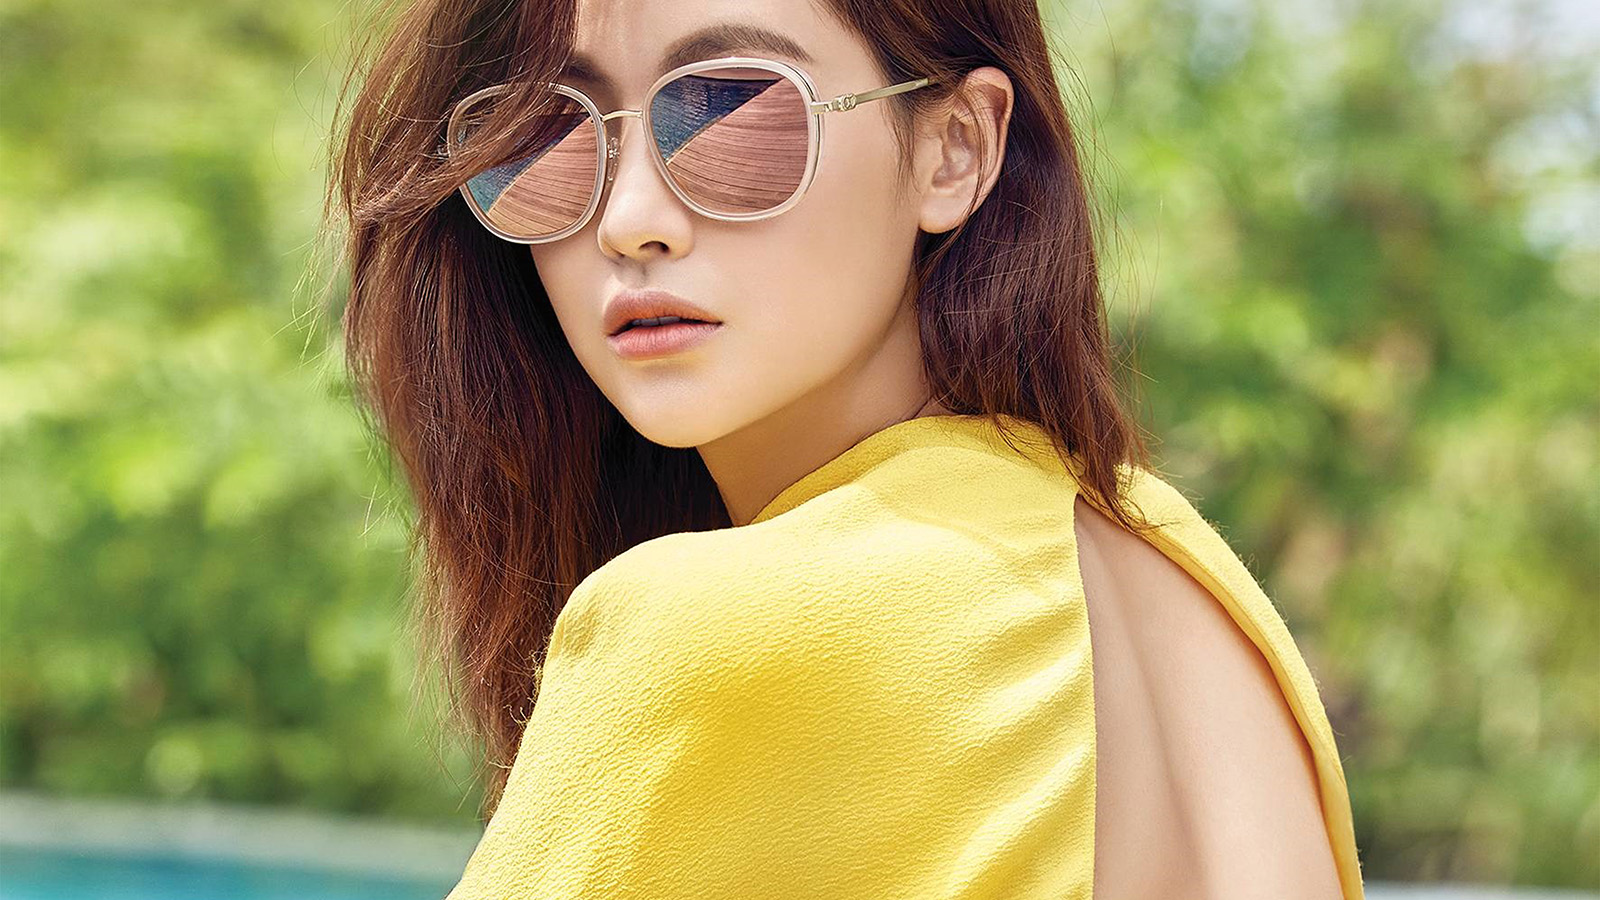 Hn08 kpop girl beauty asian korean wallpaper 1600 x 900 voltagebd Image collections